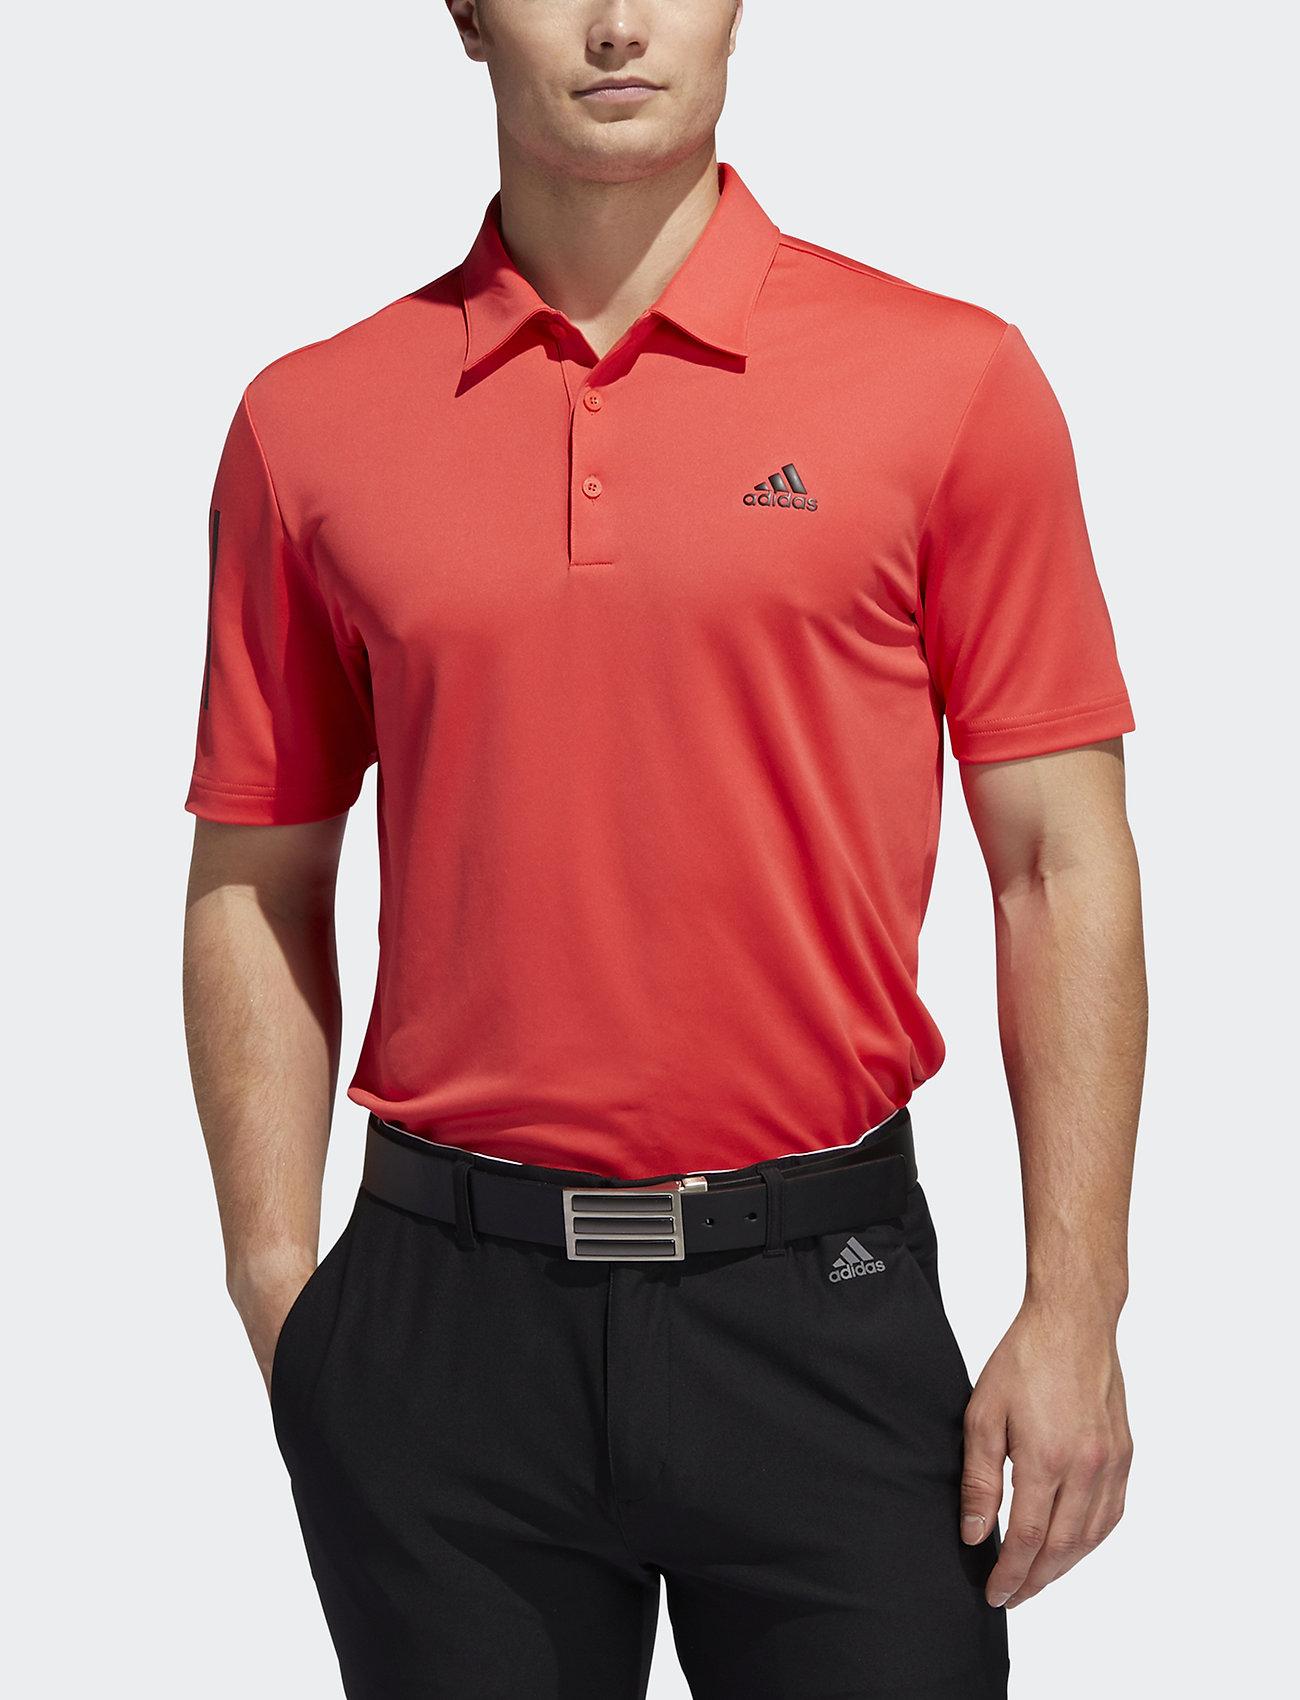 adidas Golf - 3-Stripe Basic - reacor/black - 0